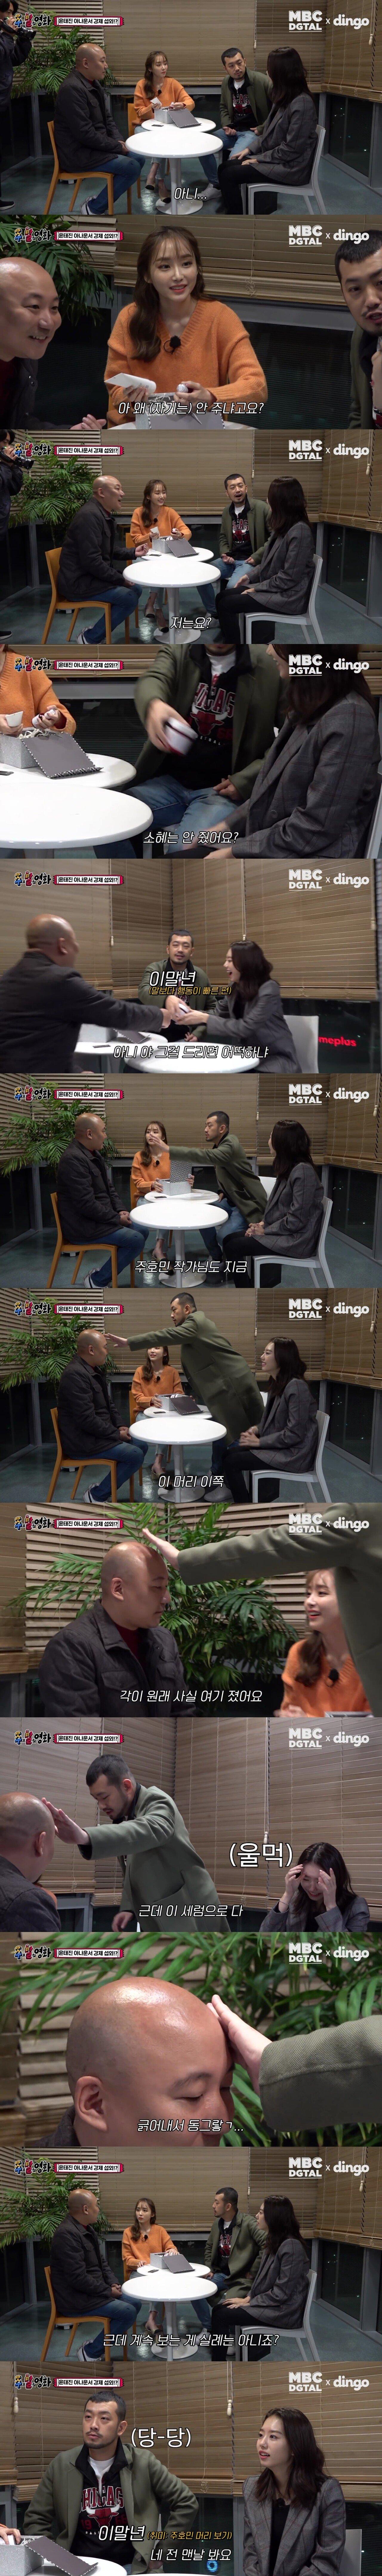 20191113_201437-vert.jpg 오늘자 이말년/논란 및 사건사고 (feat. 소혜, 미스춘향)